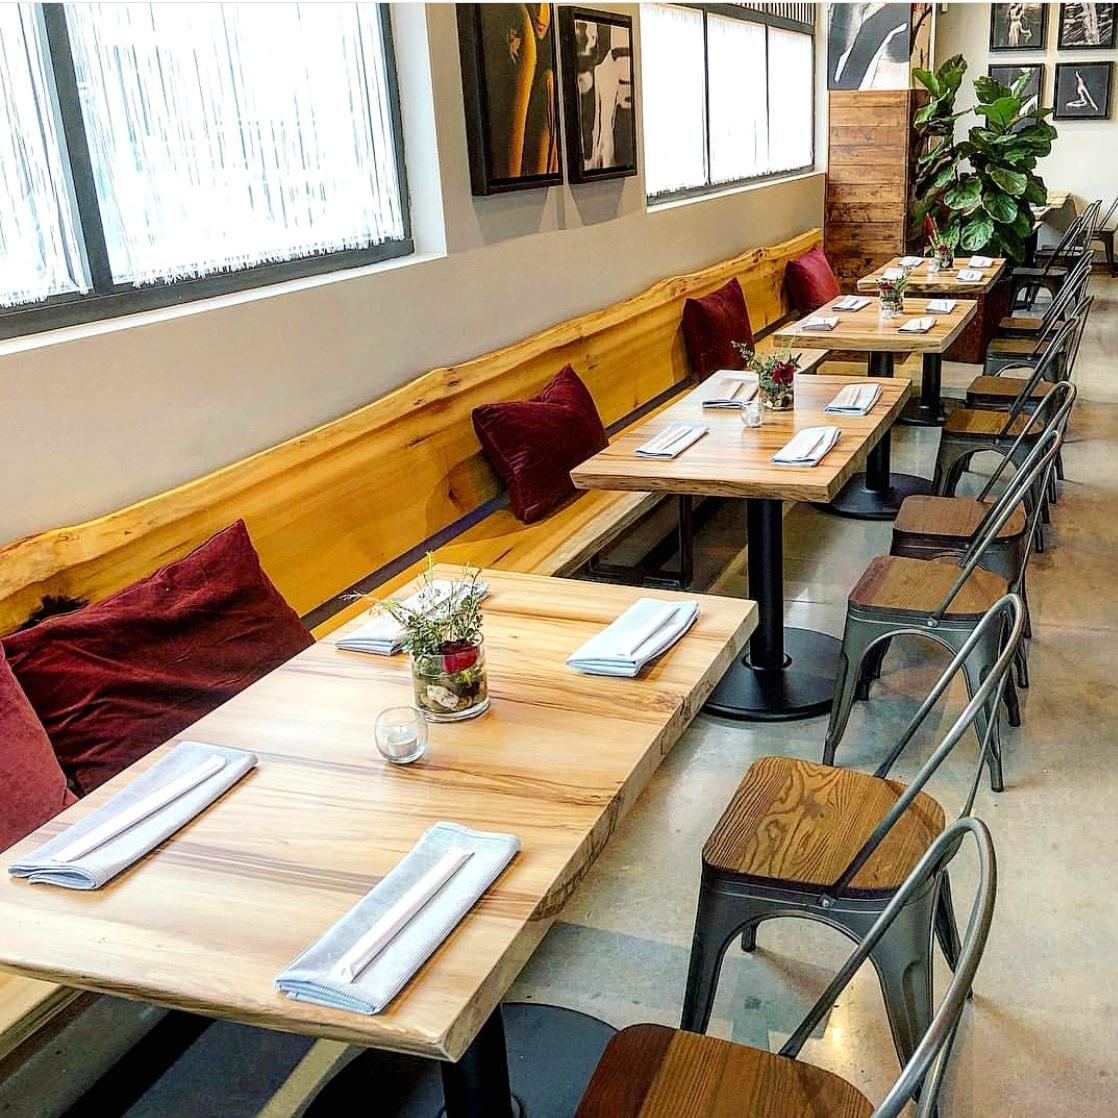 Nam Kitchen Eutree Poplar Live Edge Wood Slabs